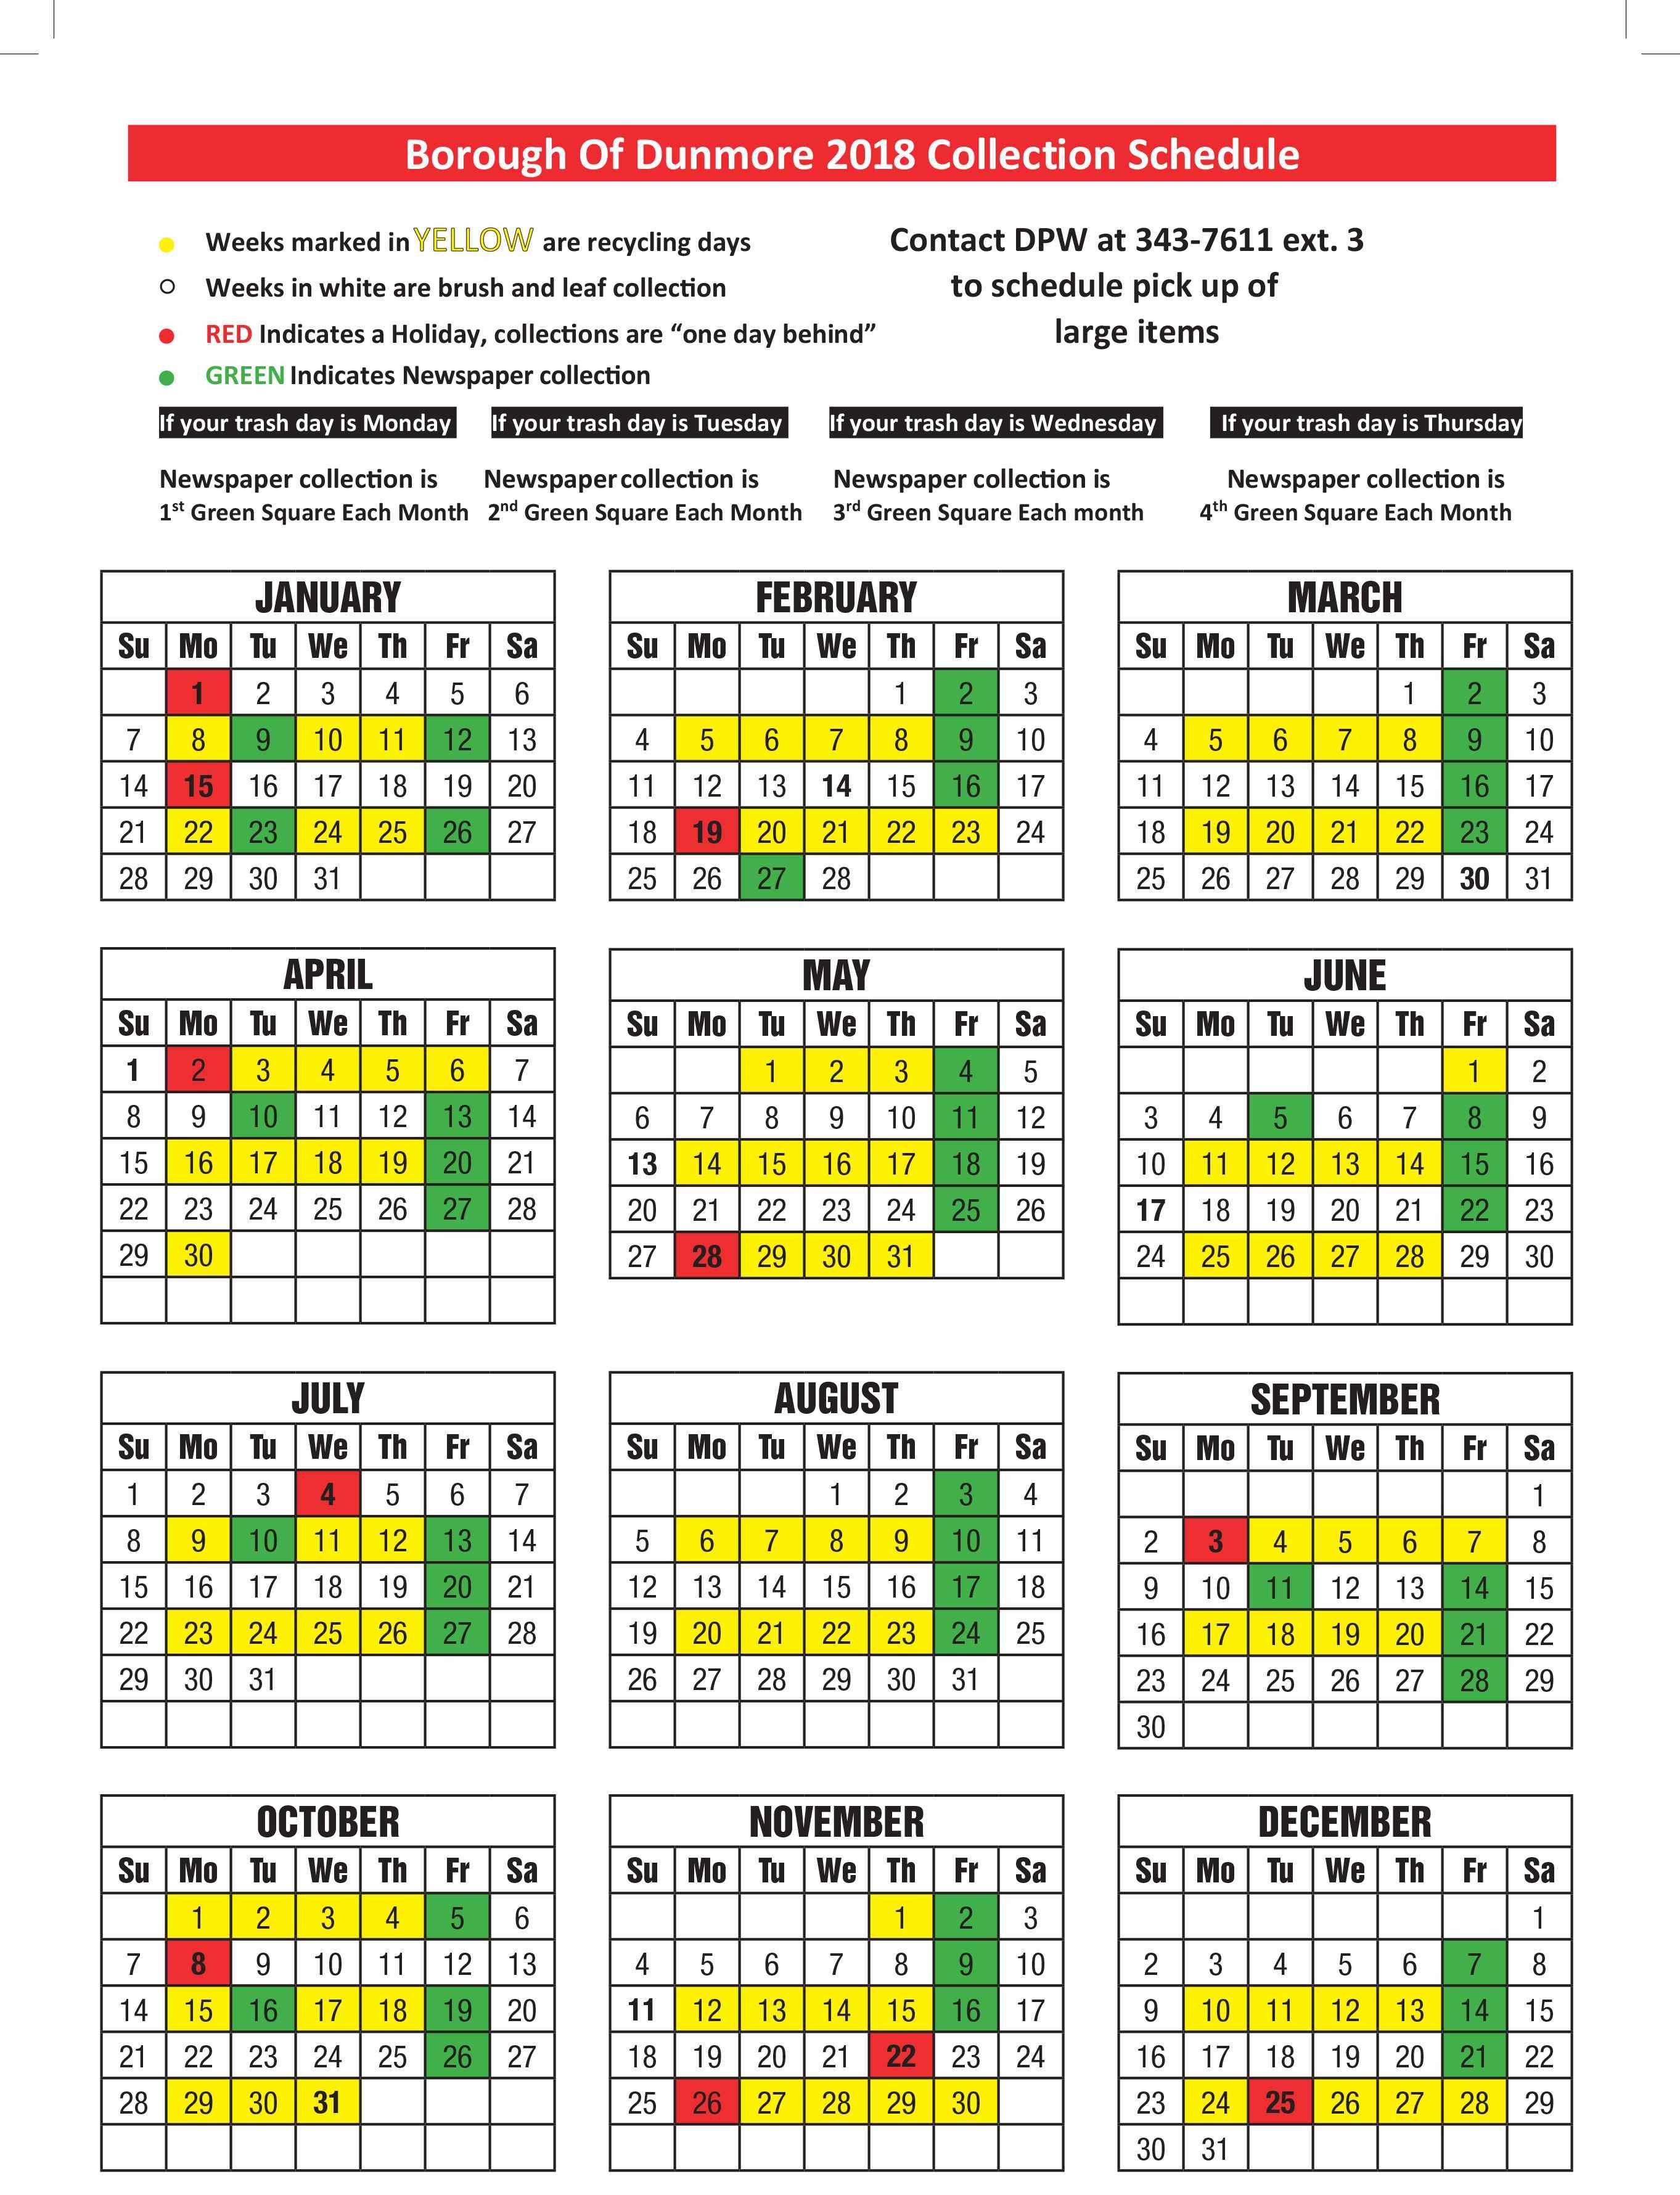 The Borough's refuse Calendar for 2018